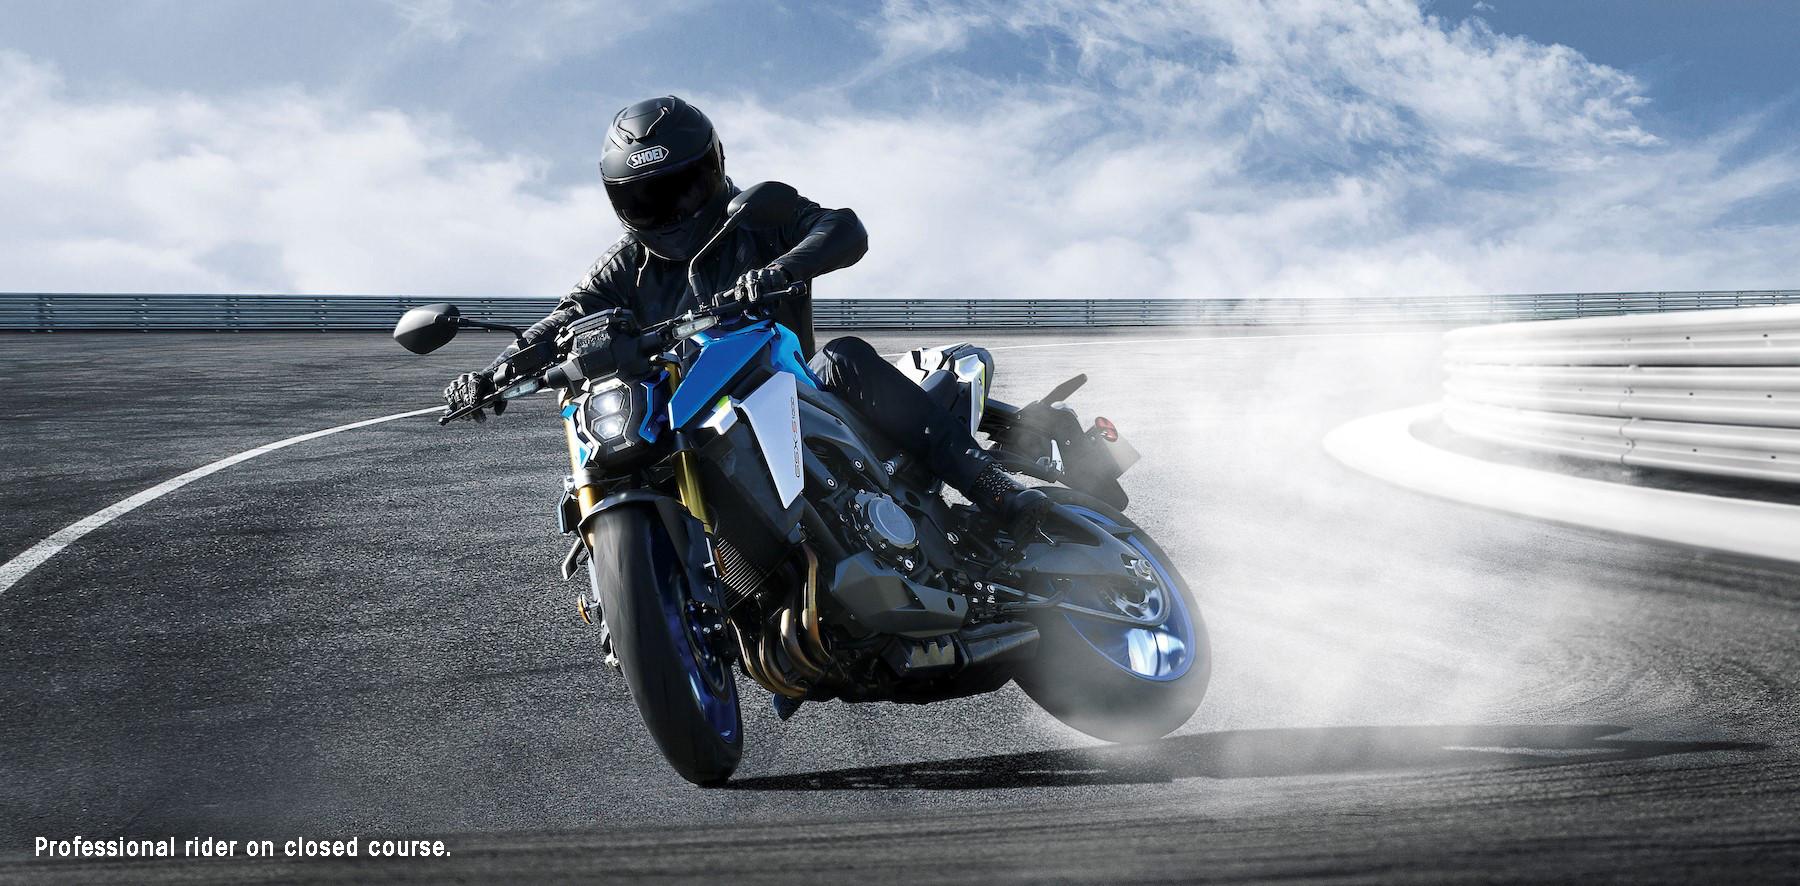 The 2022 Suzuki GSX-S1000 delivers the perfect balance of performance, agility, and style. Photo courtesy Suzuki Motor USA, LLC.